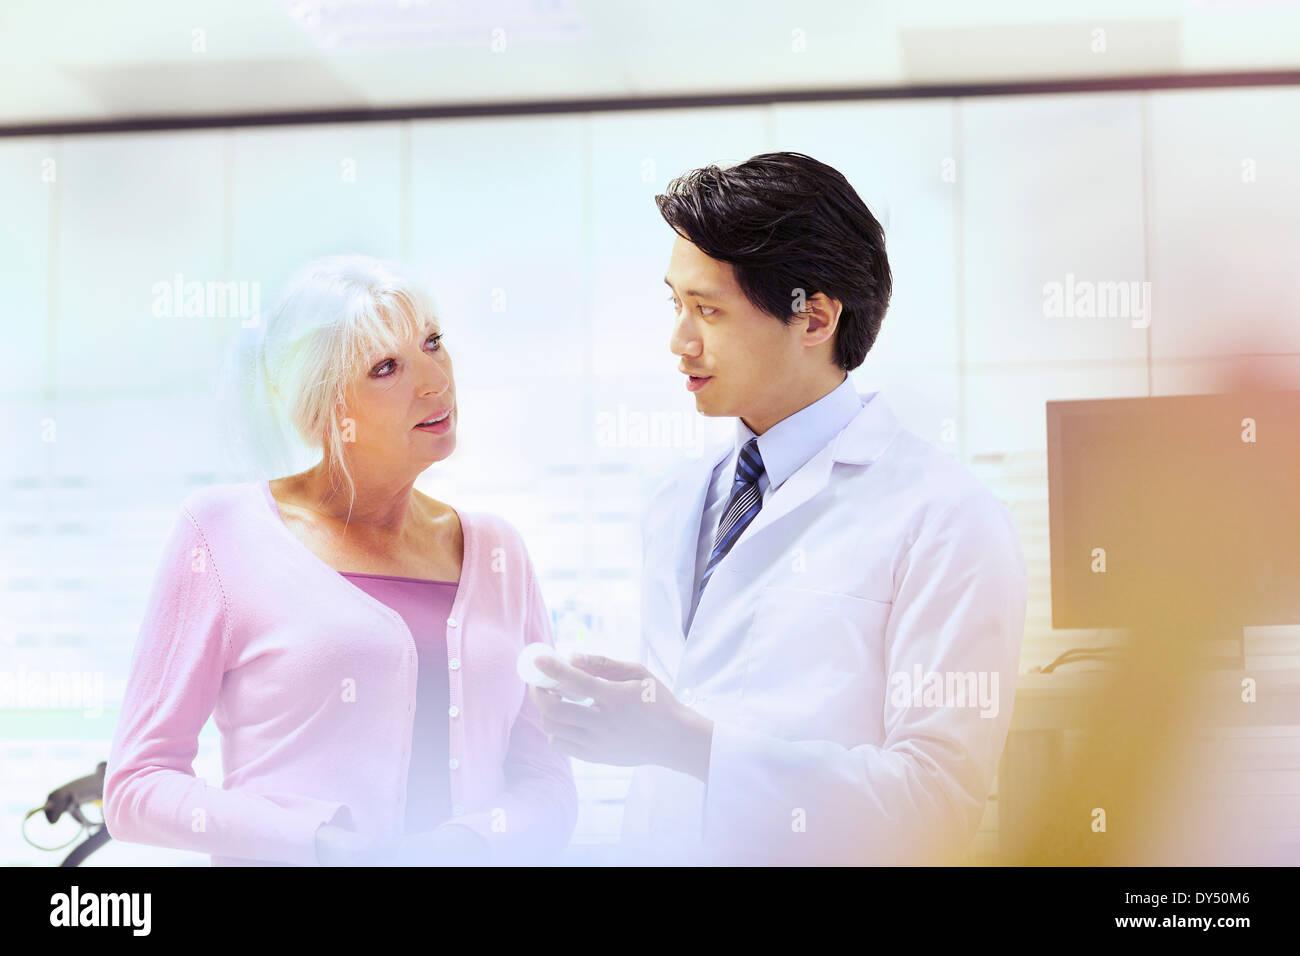 Pharmacist advising customer on medication - Stock Image